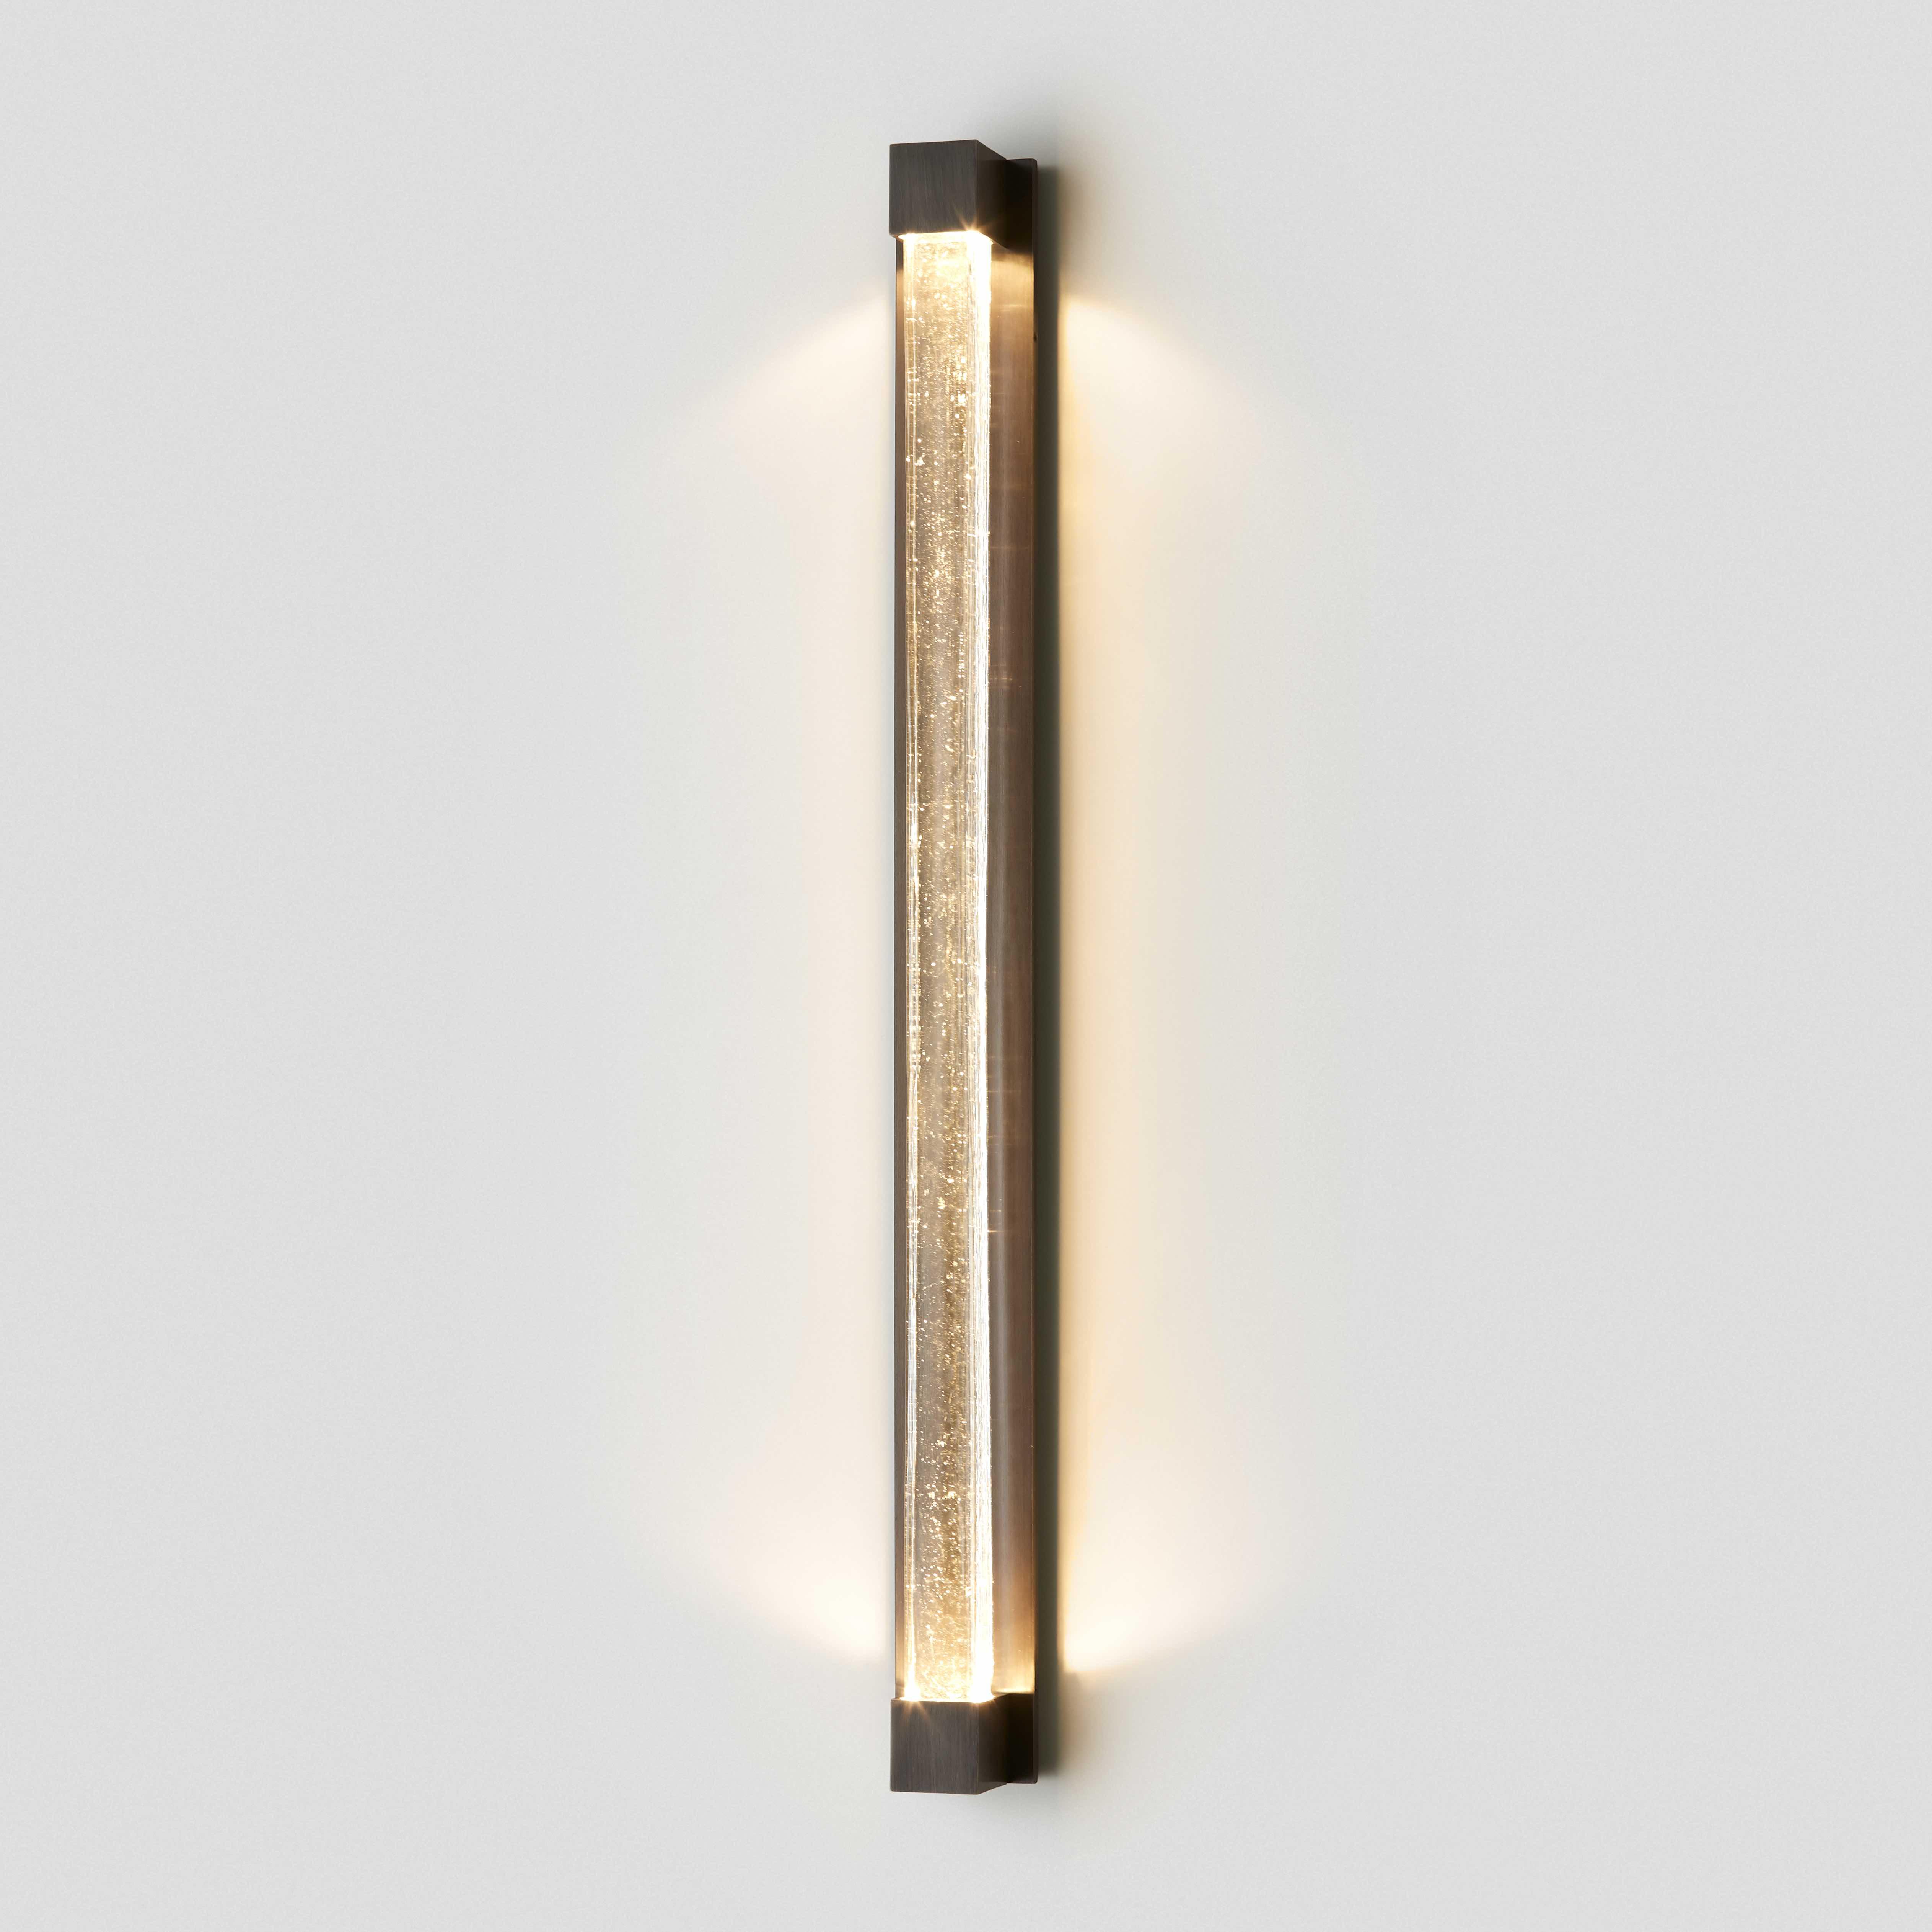 Articolo-Lighting-Fini-Wall-Sconce-Clear